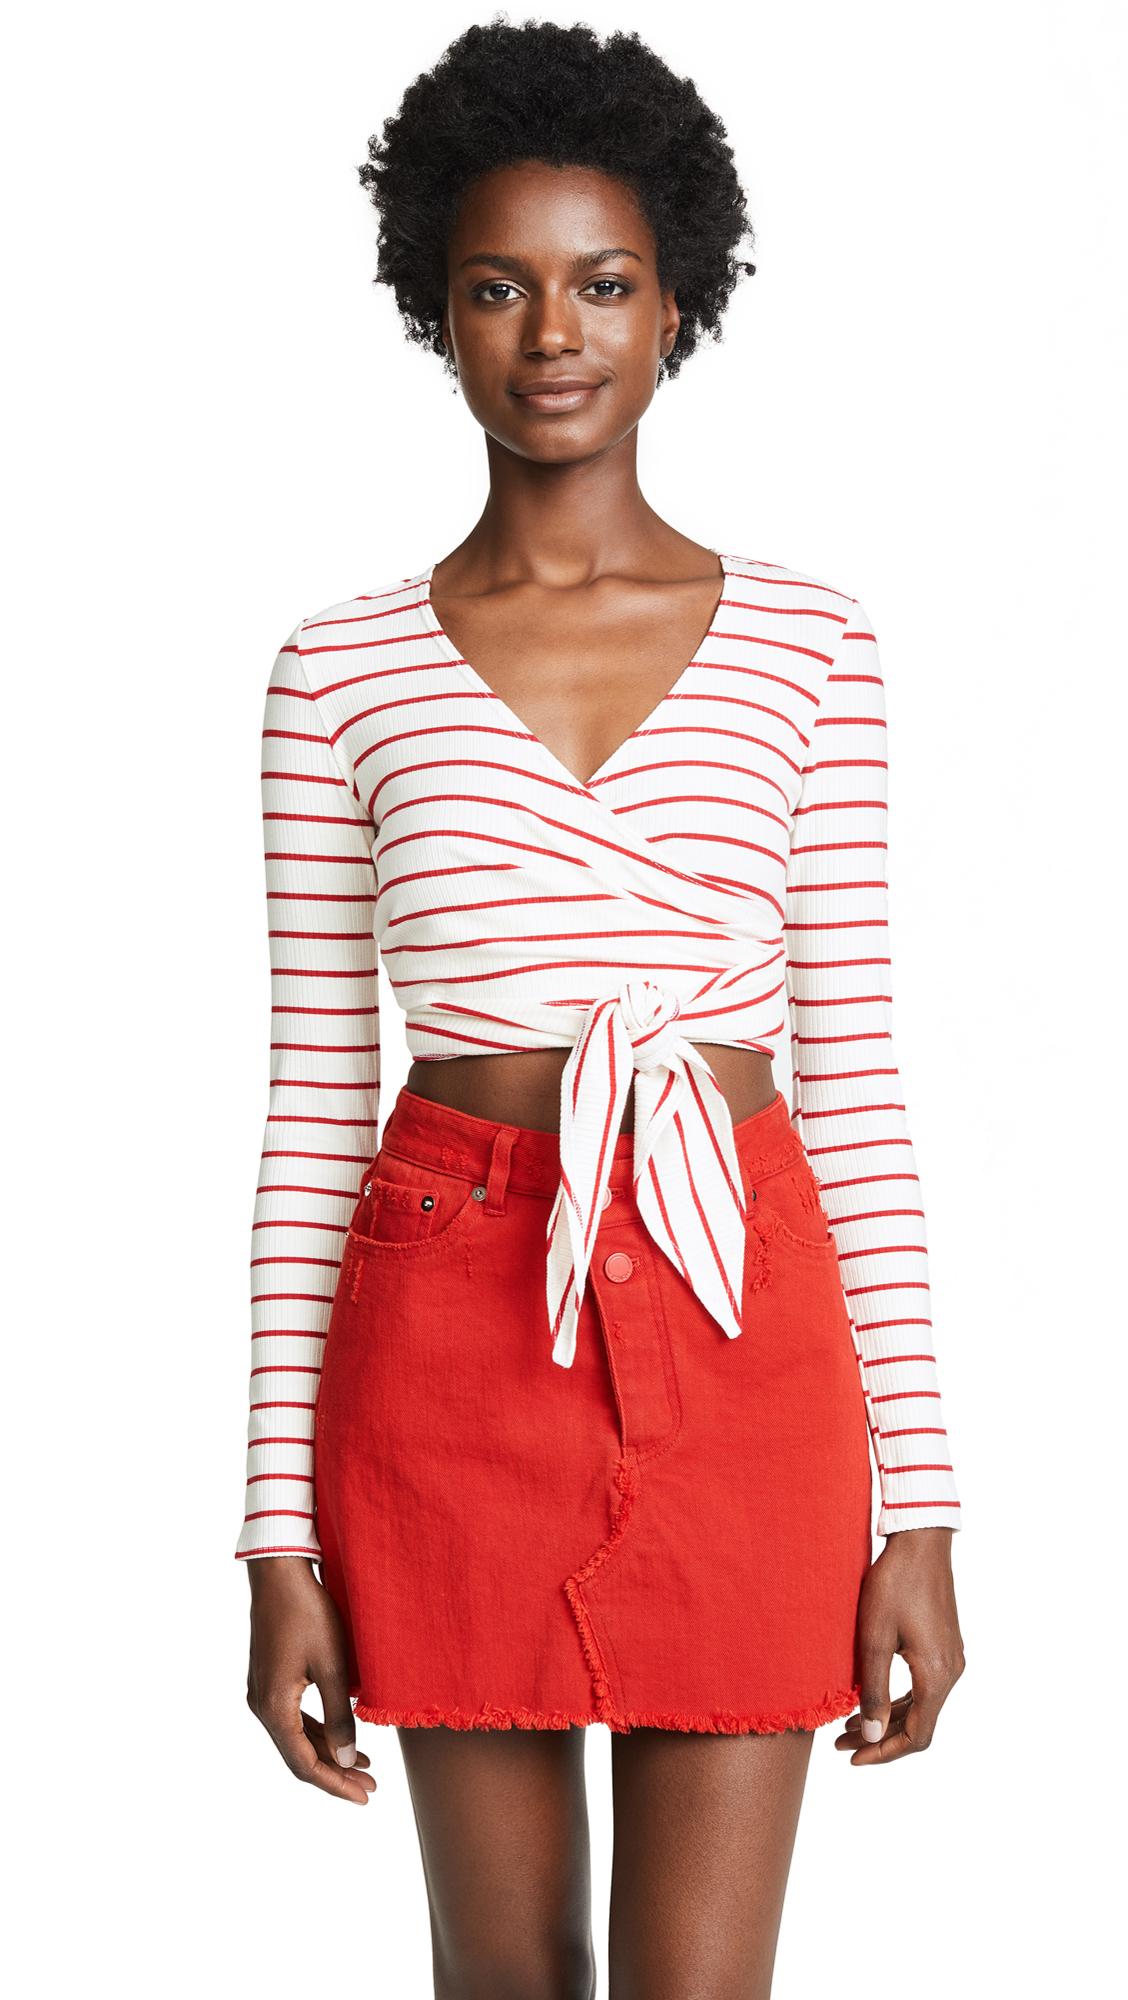 FLYNN SKYE Wrap Ribbed Top in Red Stripe Rib